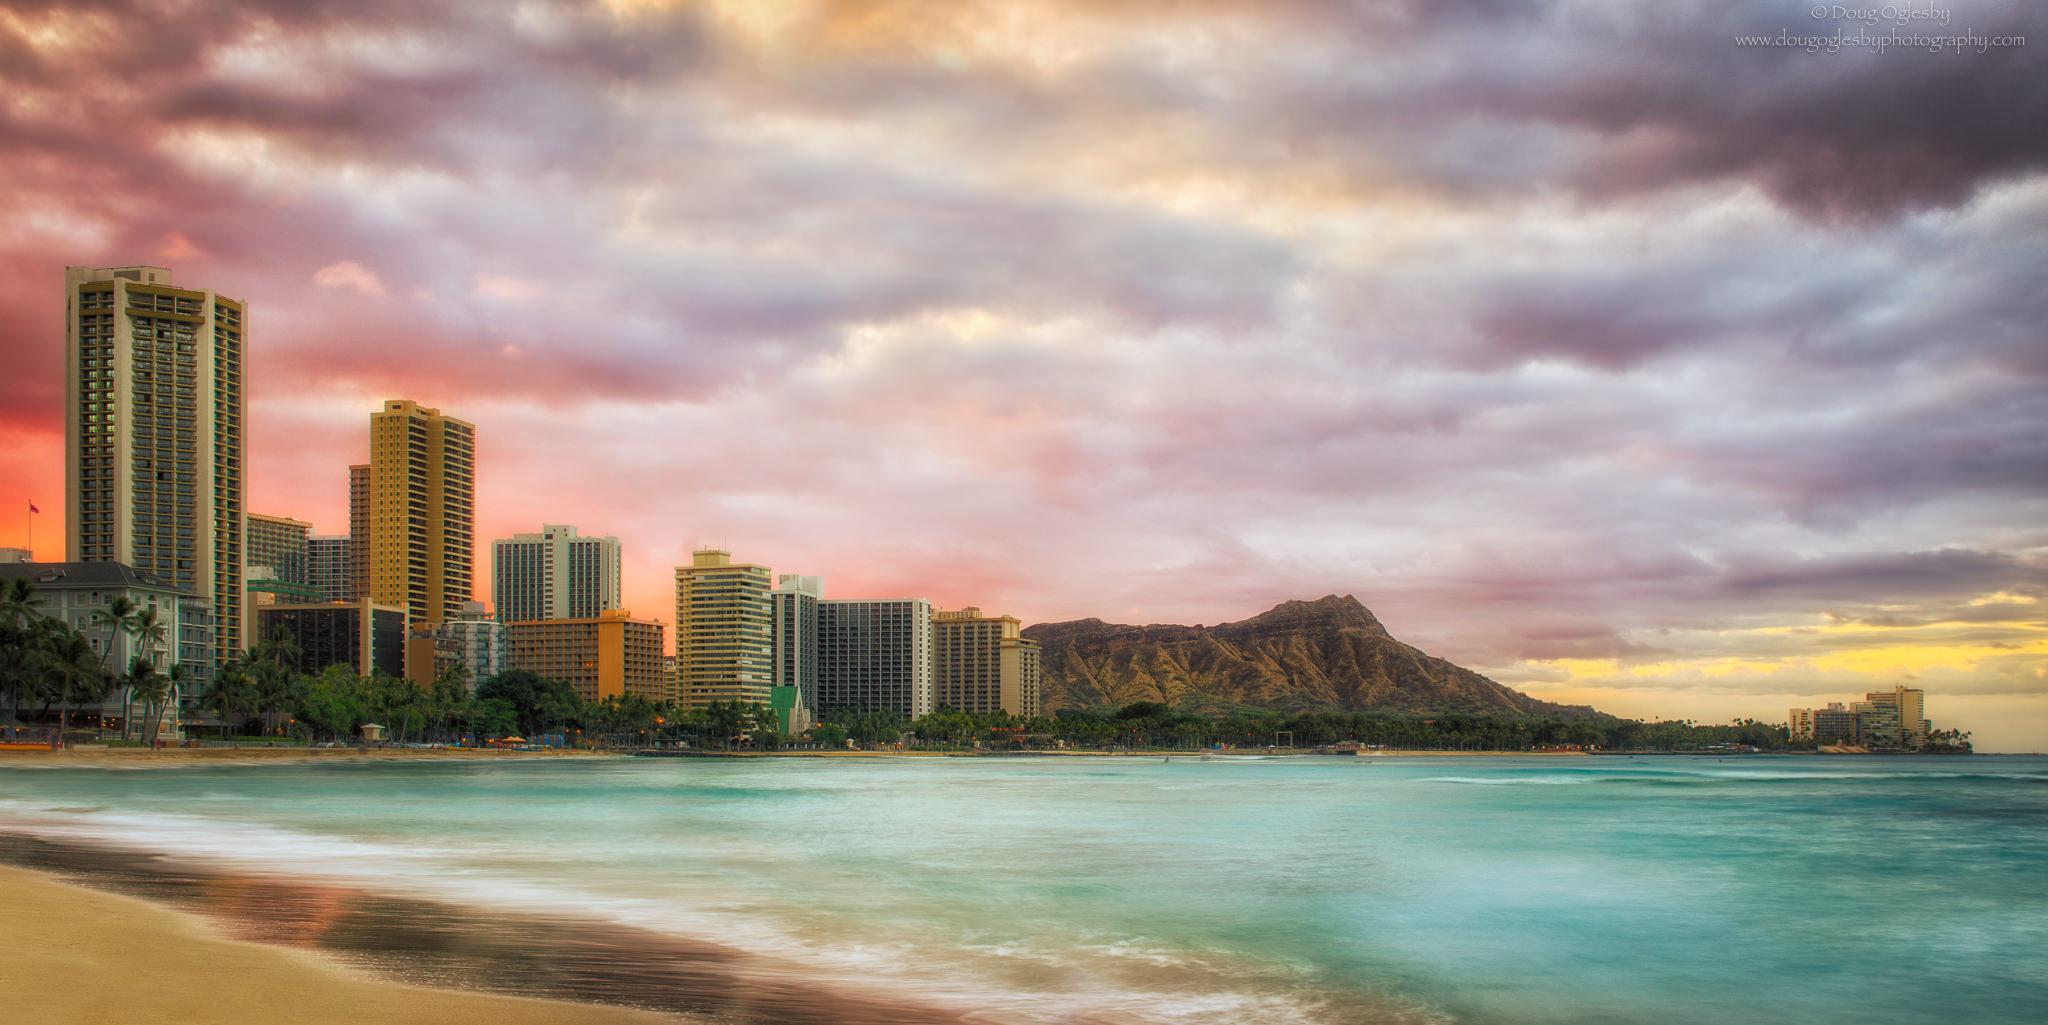 Sunrise at Waikiki on O'ahu. Copyright image by Photographer Doug Oglesby for https://photographyworld.org/nature/early-hawaii-history/